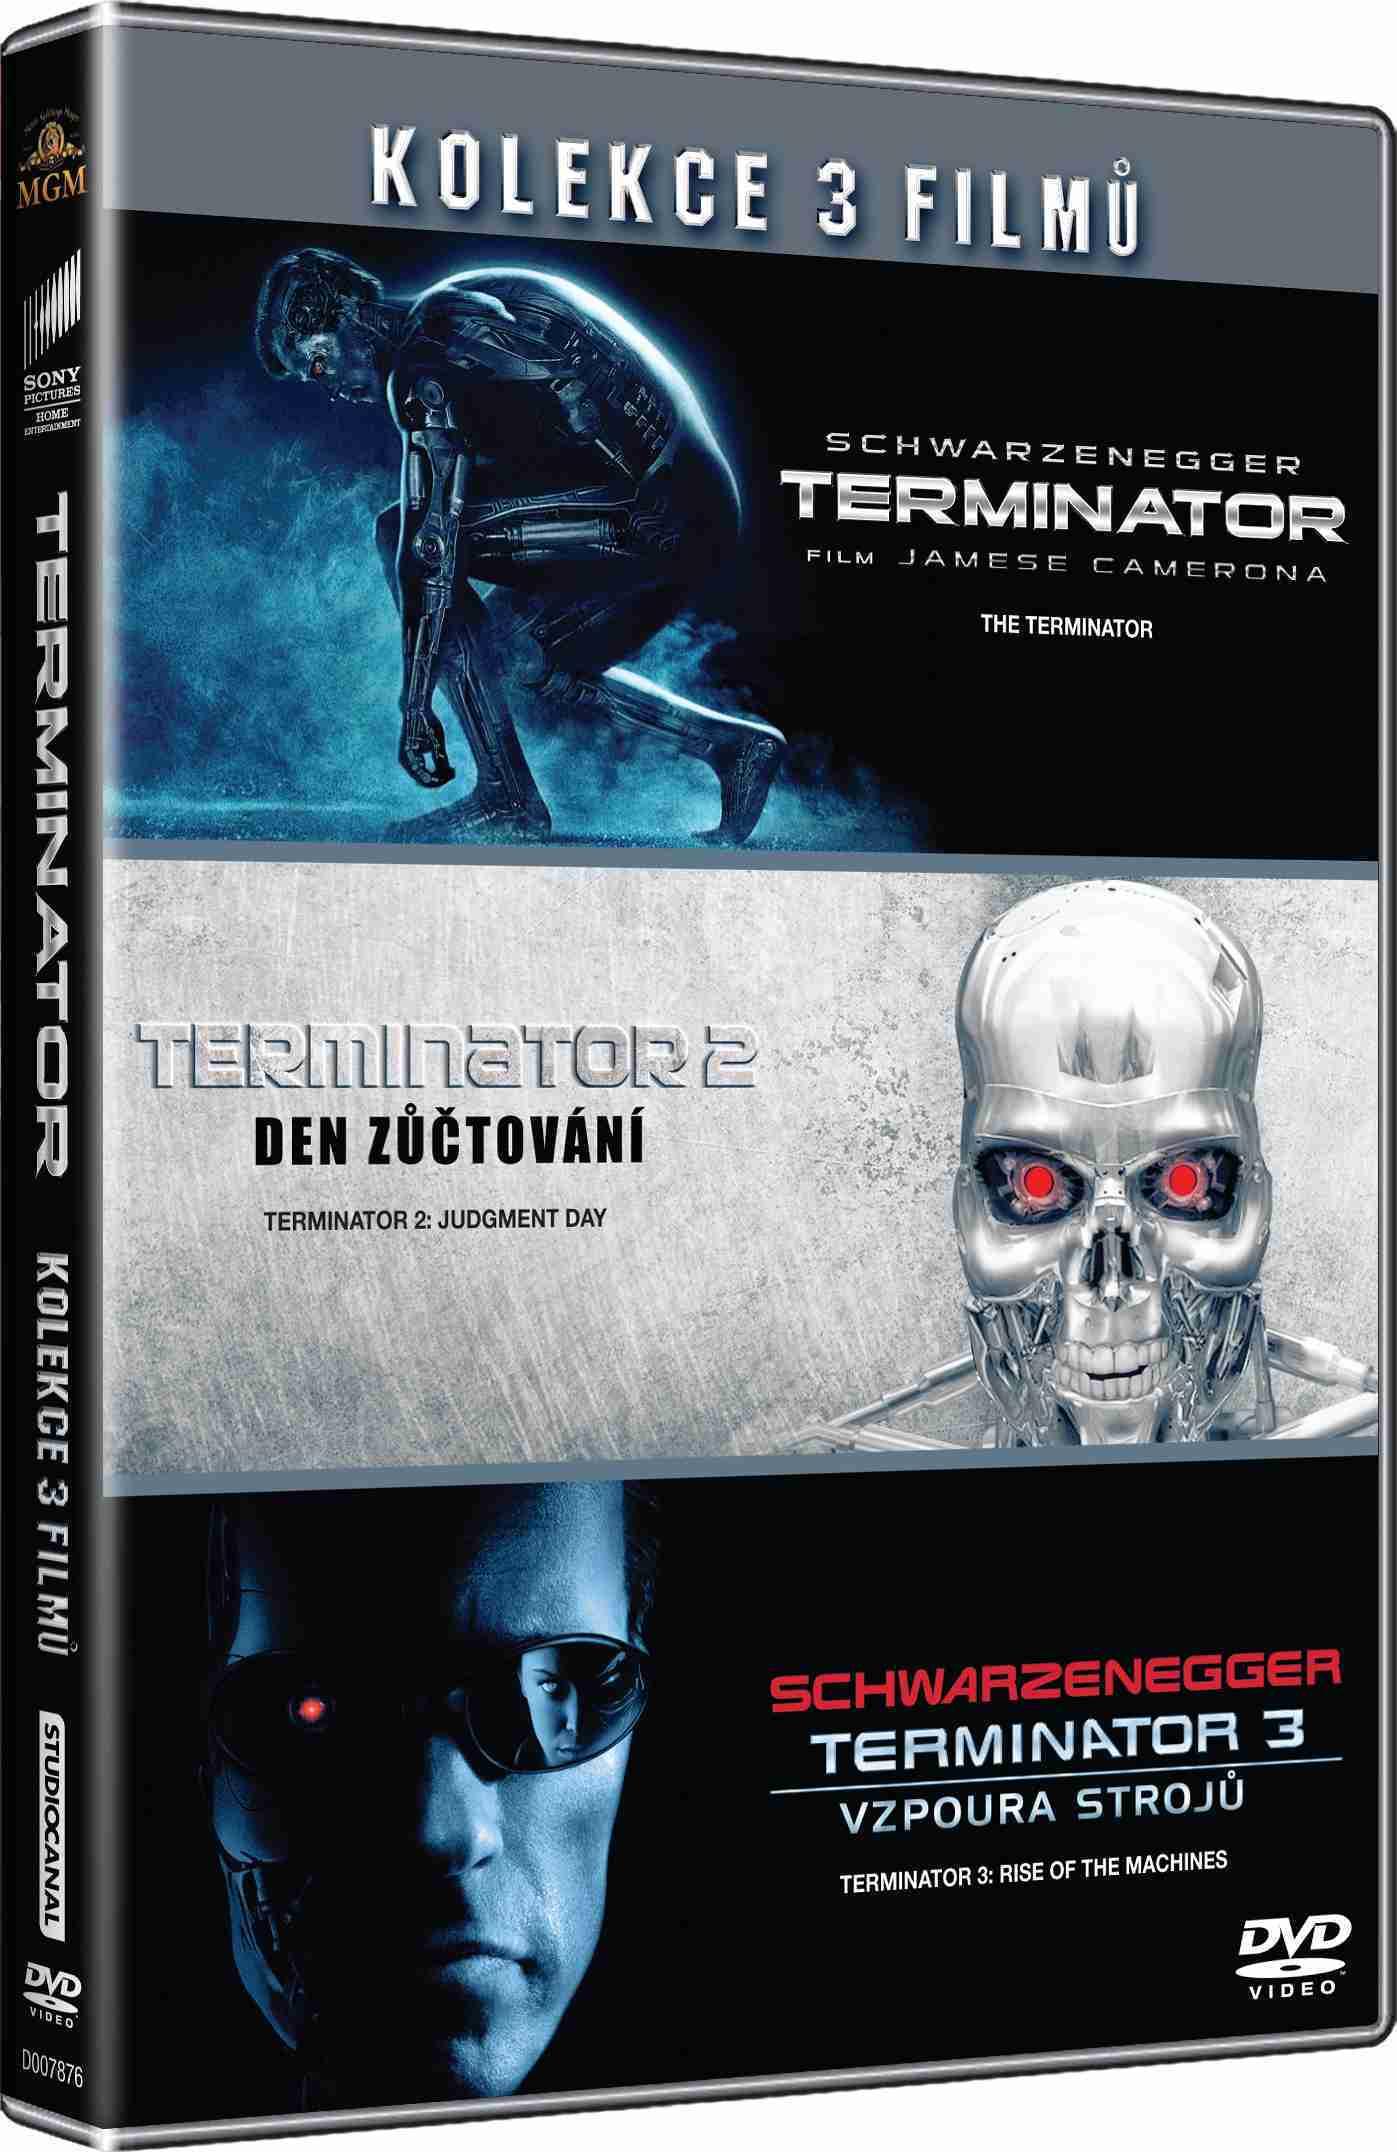 TERMINATOR 1-3 KOLEKCE - 3 DVD